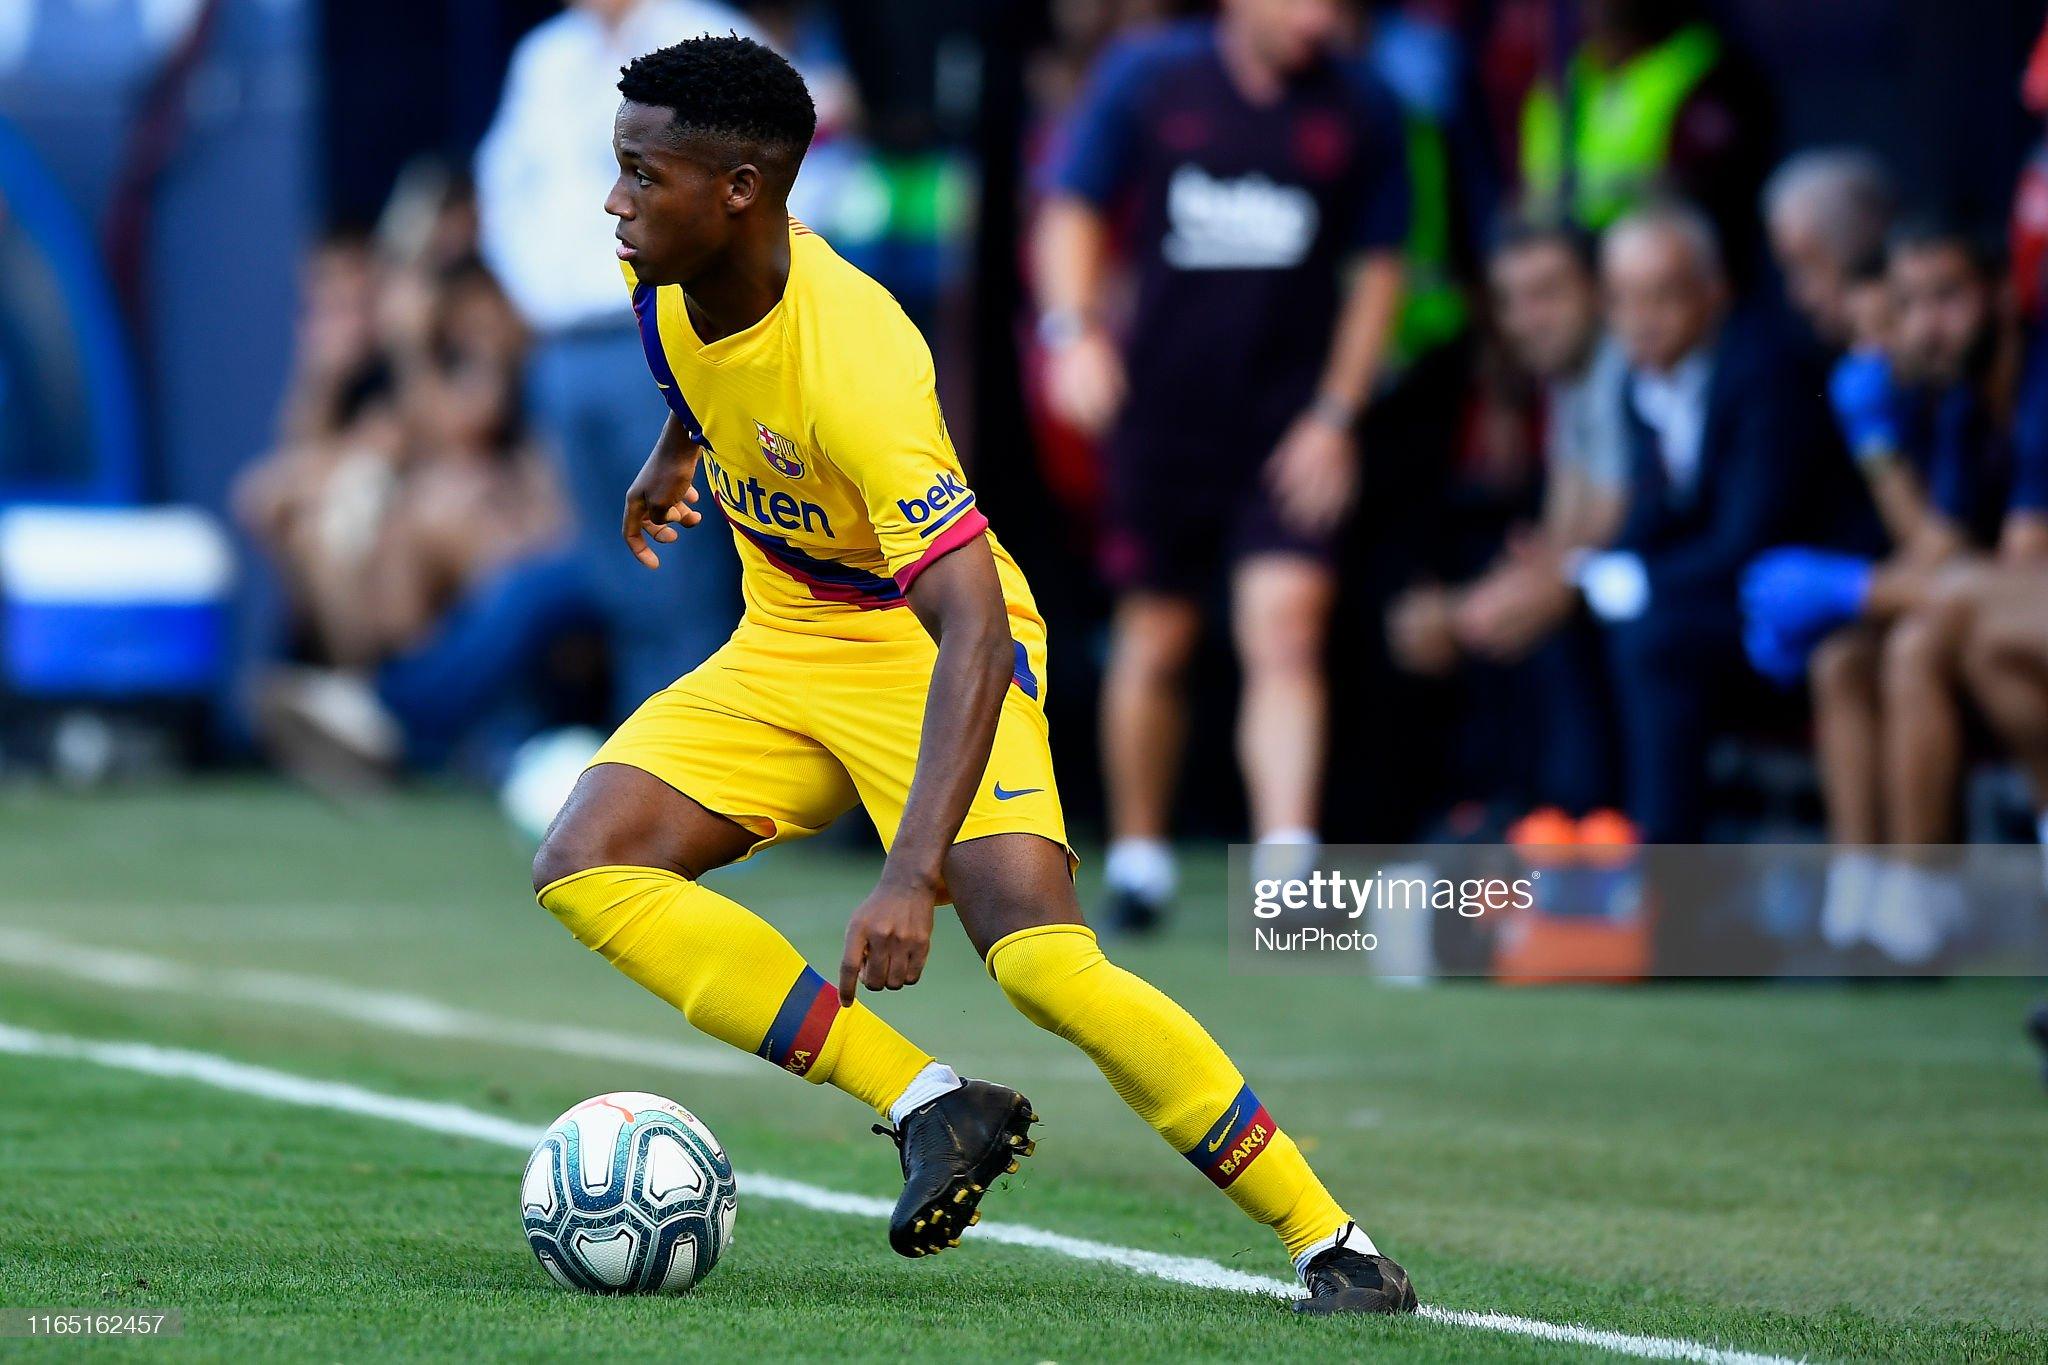 صور مباراة : أوساسونا - برشلونة 2-2 ( 31-08-2019 )  Ansu-fati-of-barcelona-controls-the-ball-during-the-liga-match-ca-picture-id1165162457?s=2048x2048